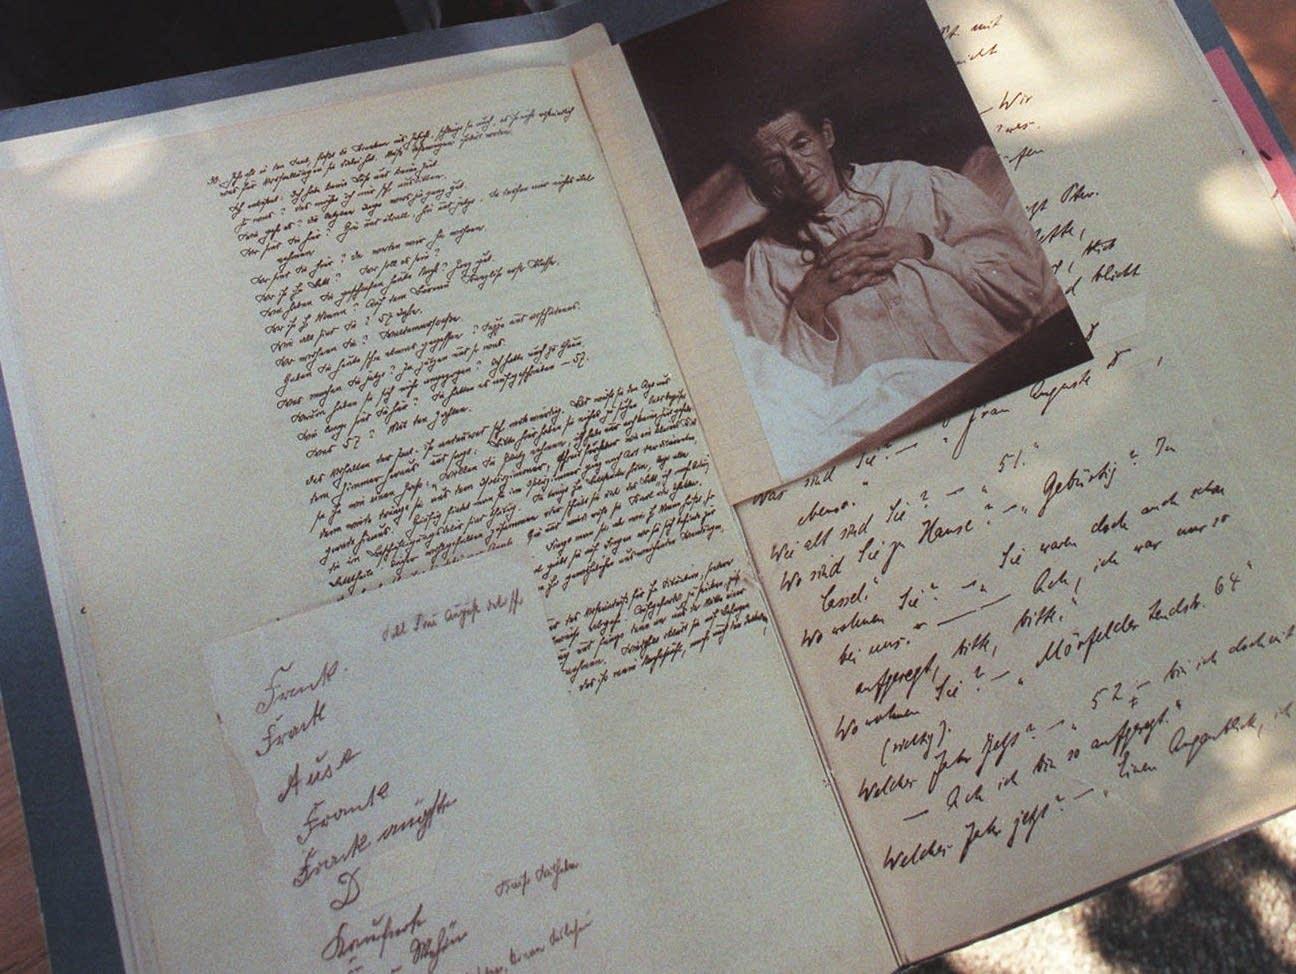 Dr. Alois Alzheimer medical file